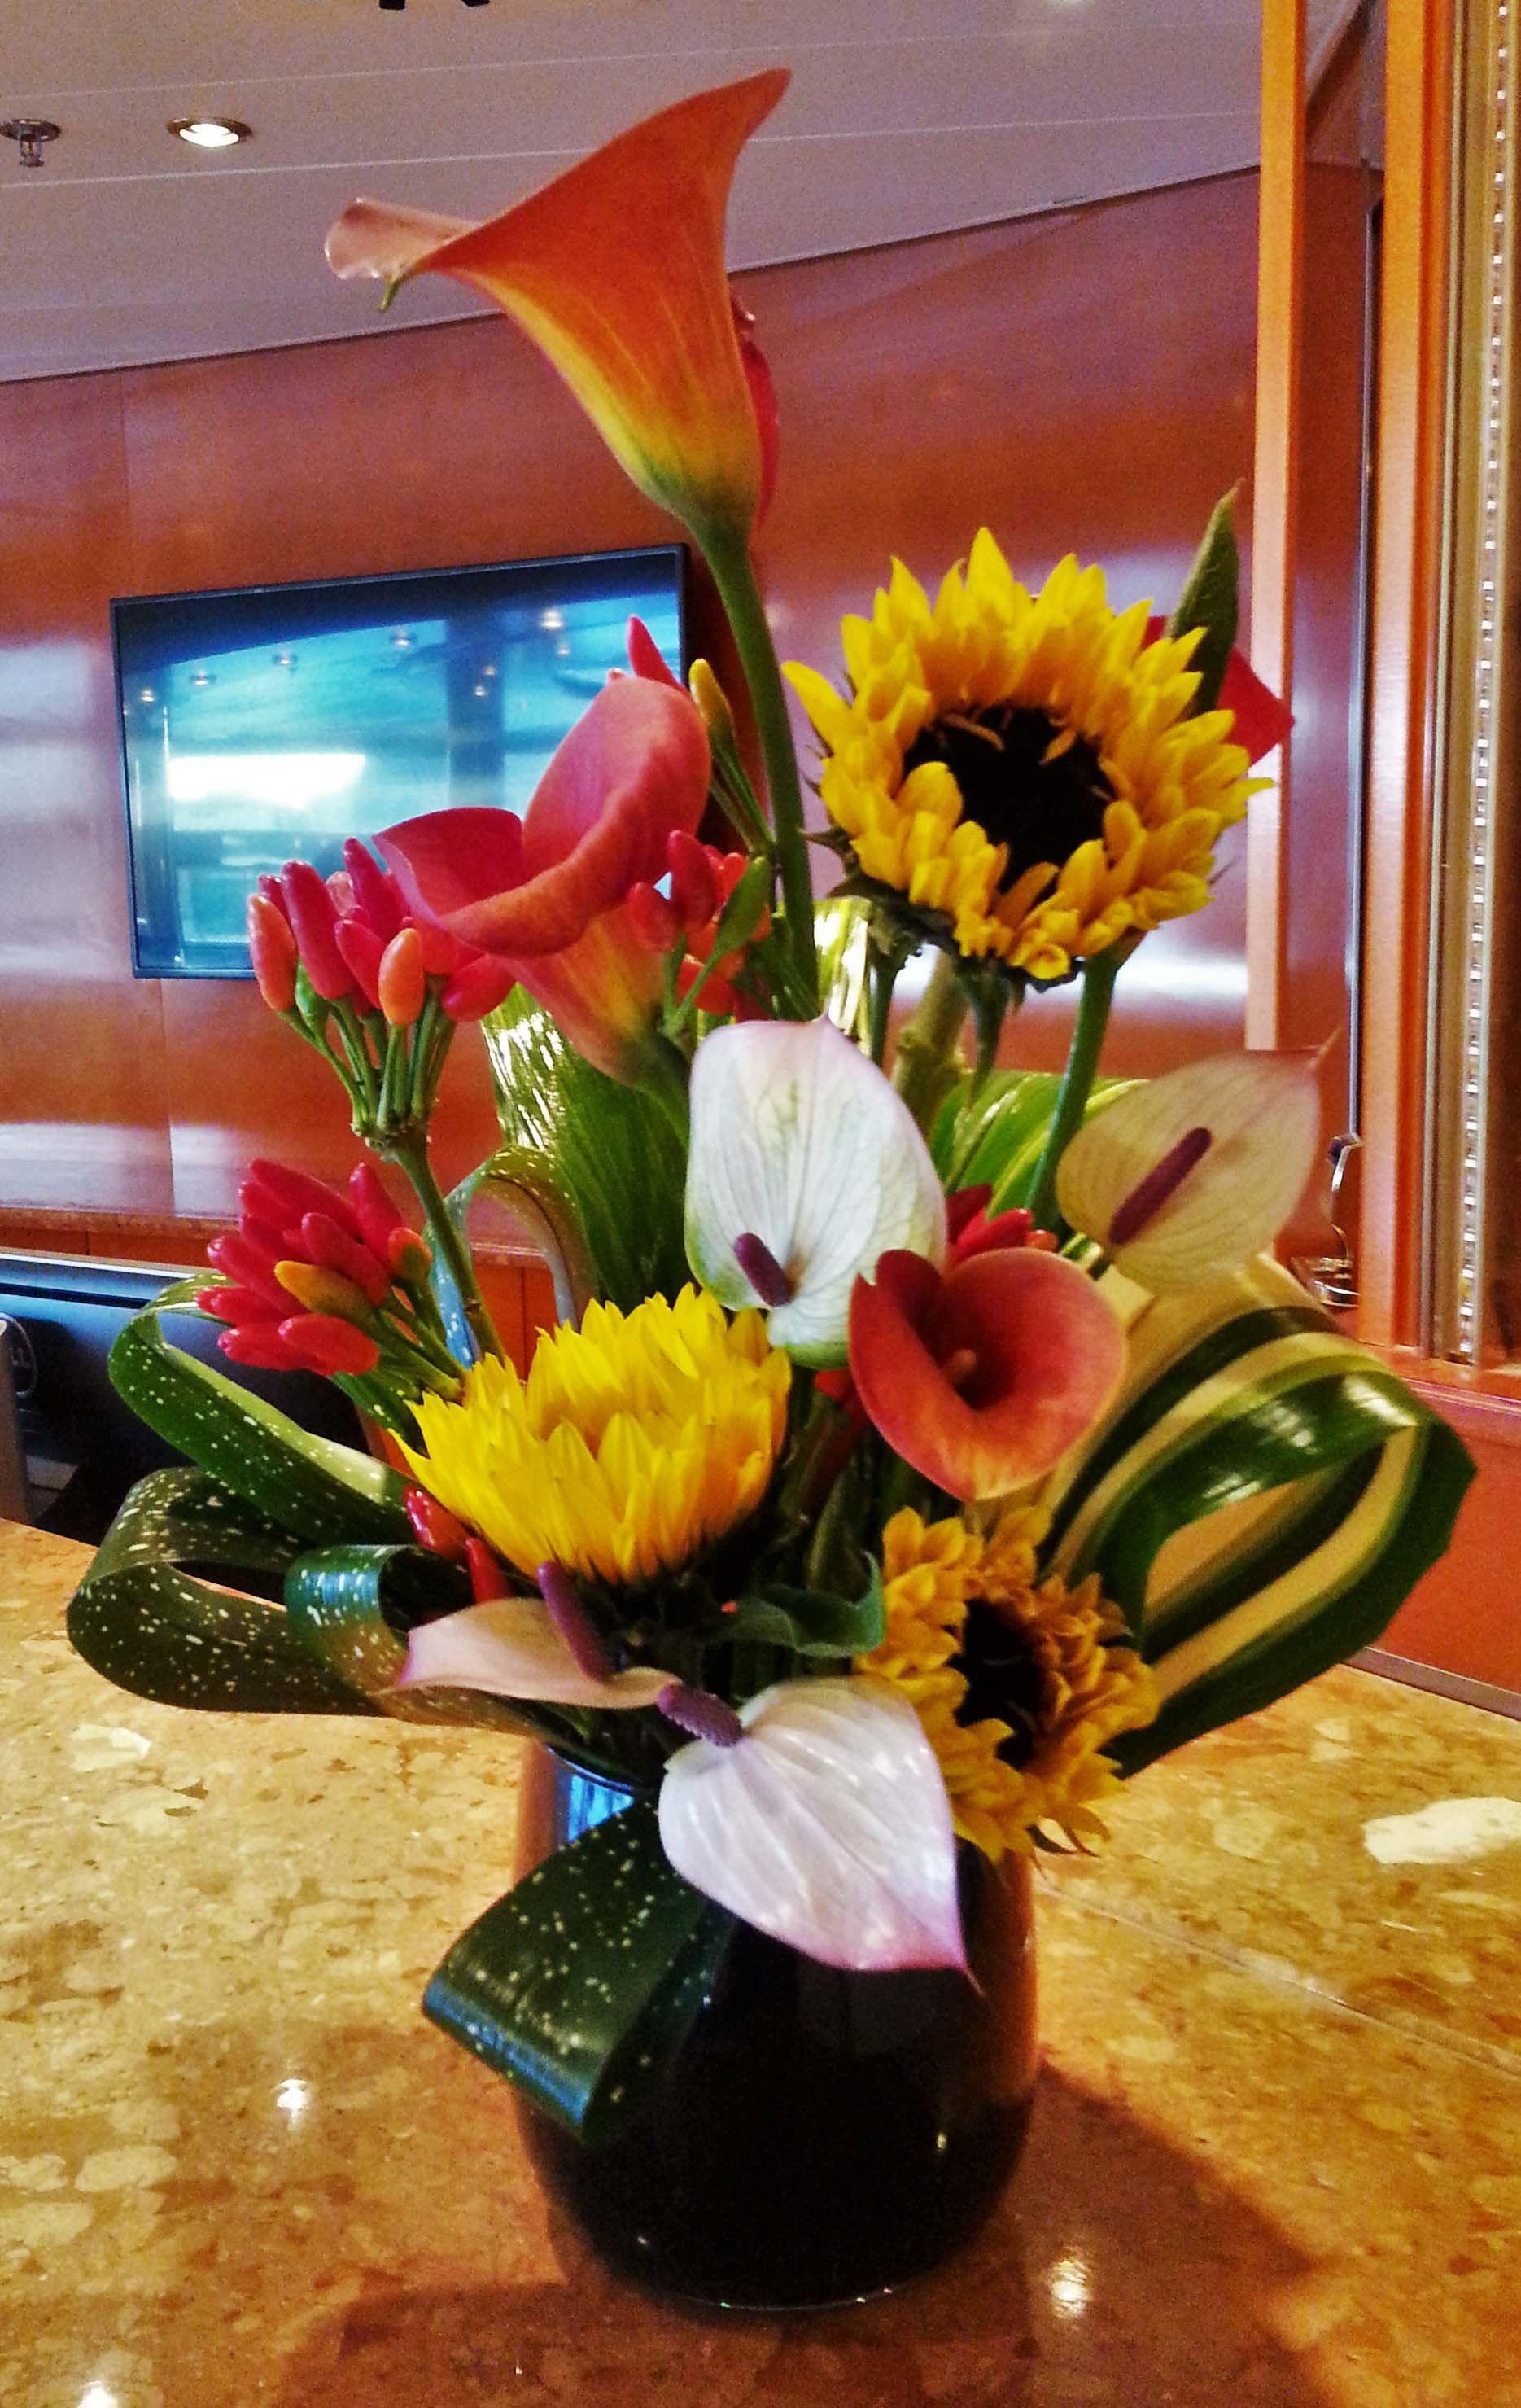 pink flowers in glass vase of 21 flower arrangement in vase the weekly world regarding 3 od sunflower orange calla lily pink anthurium chilli peppers